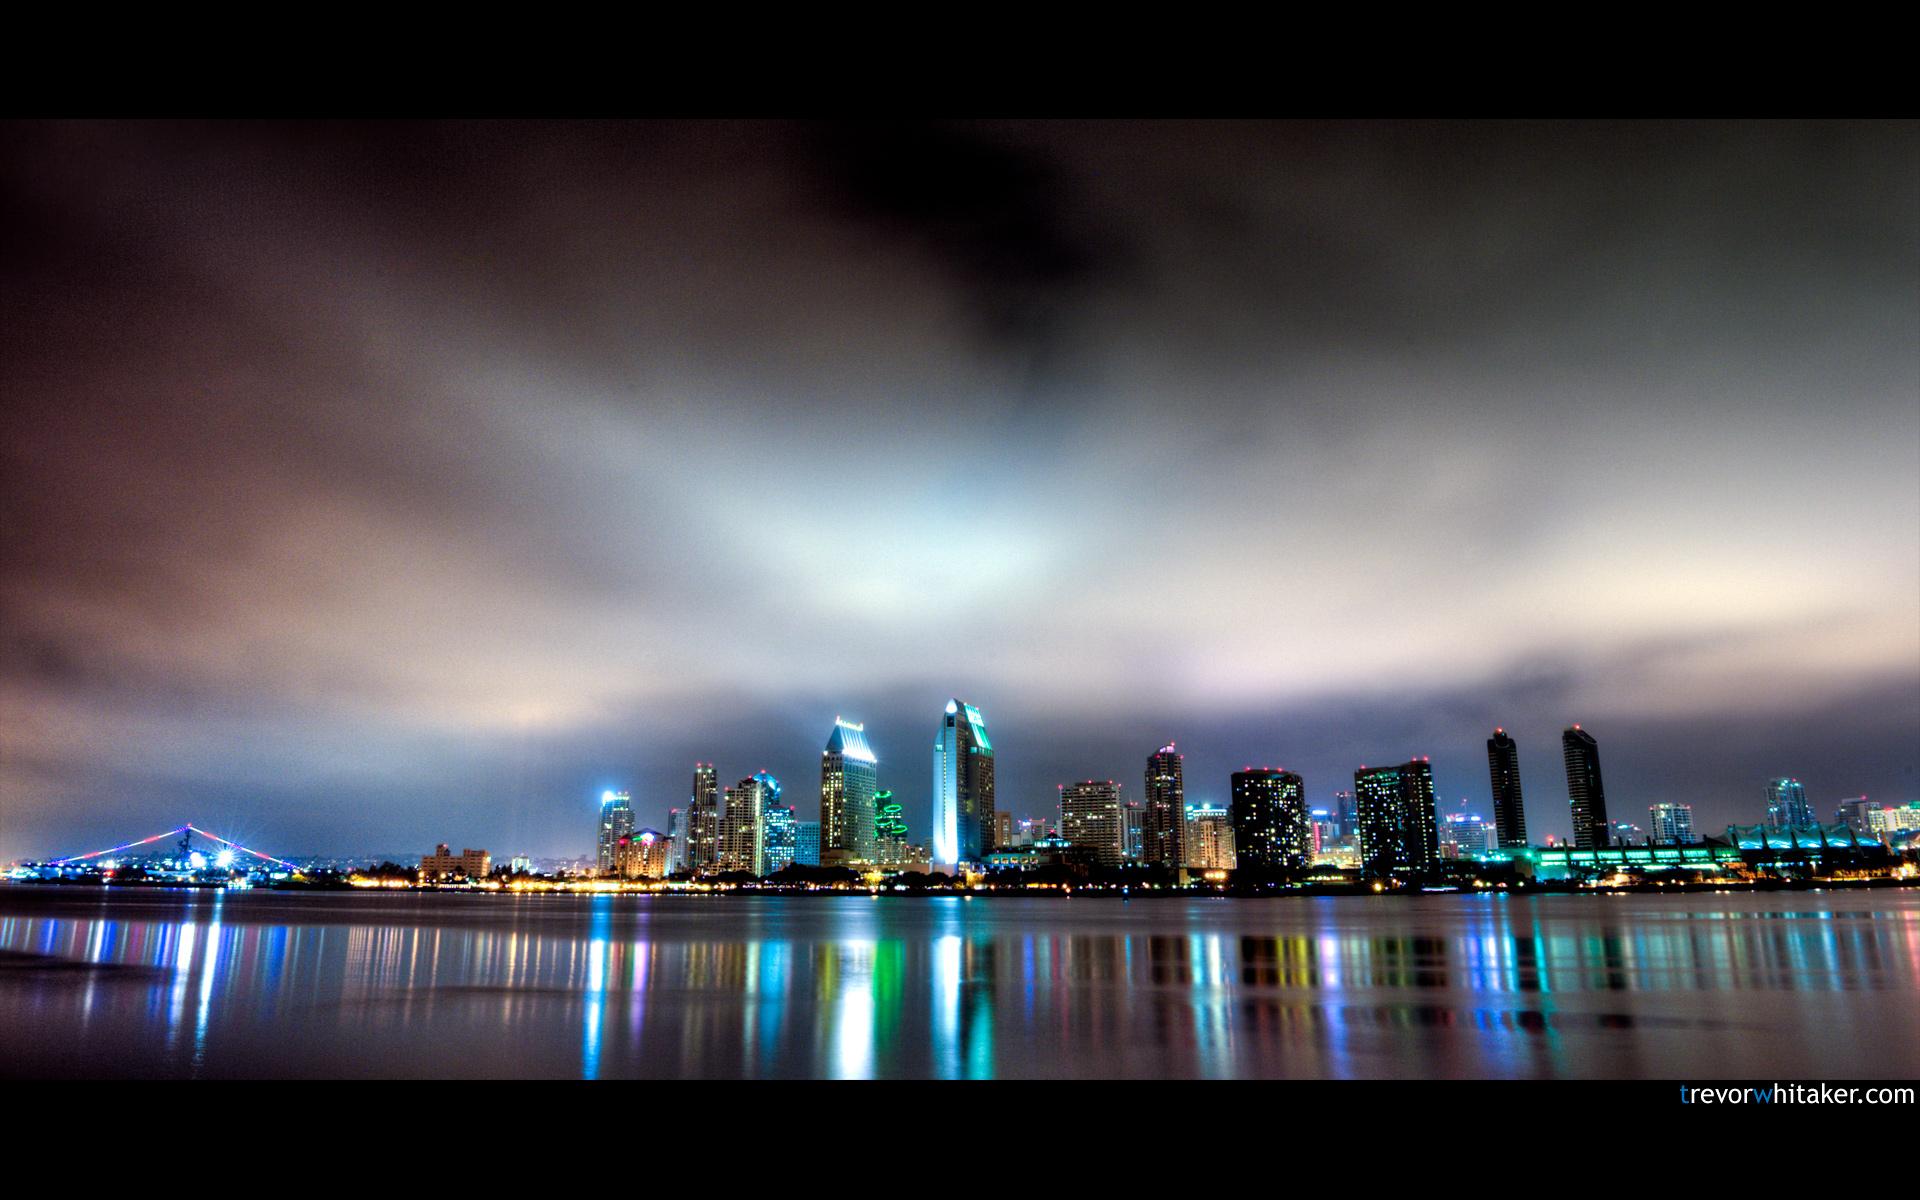 35+ HD Seattle Skyline Wallpapers on WallpaperSafari